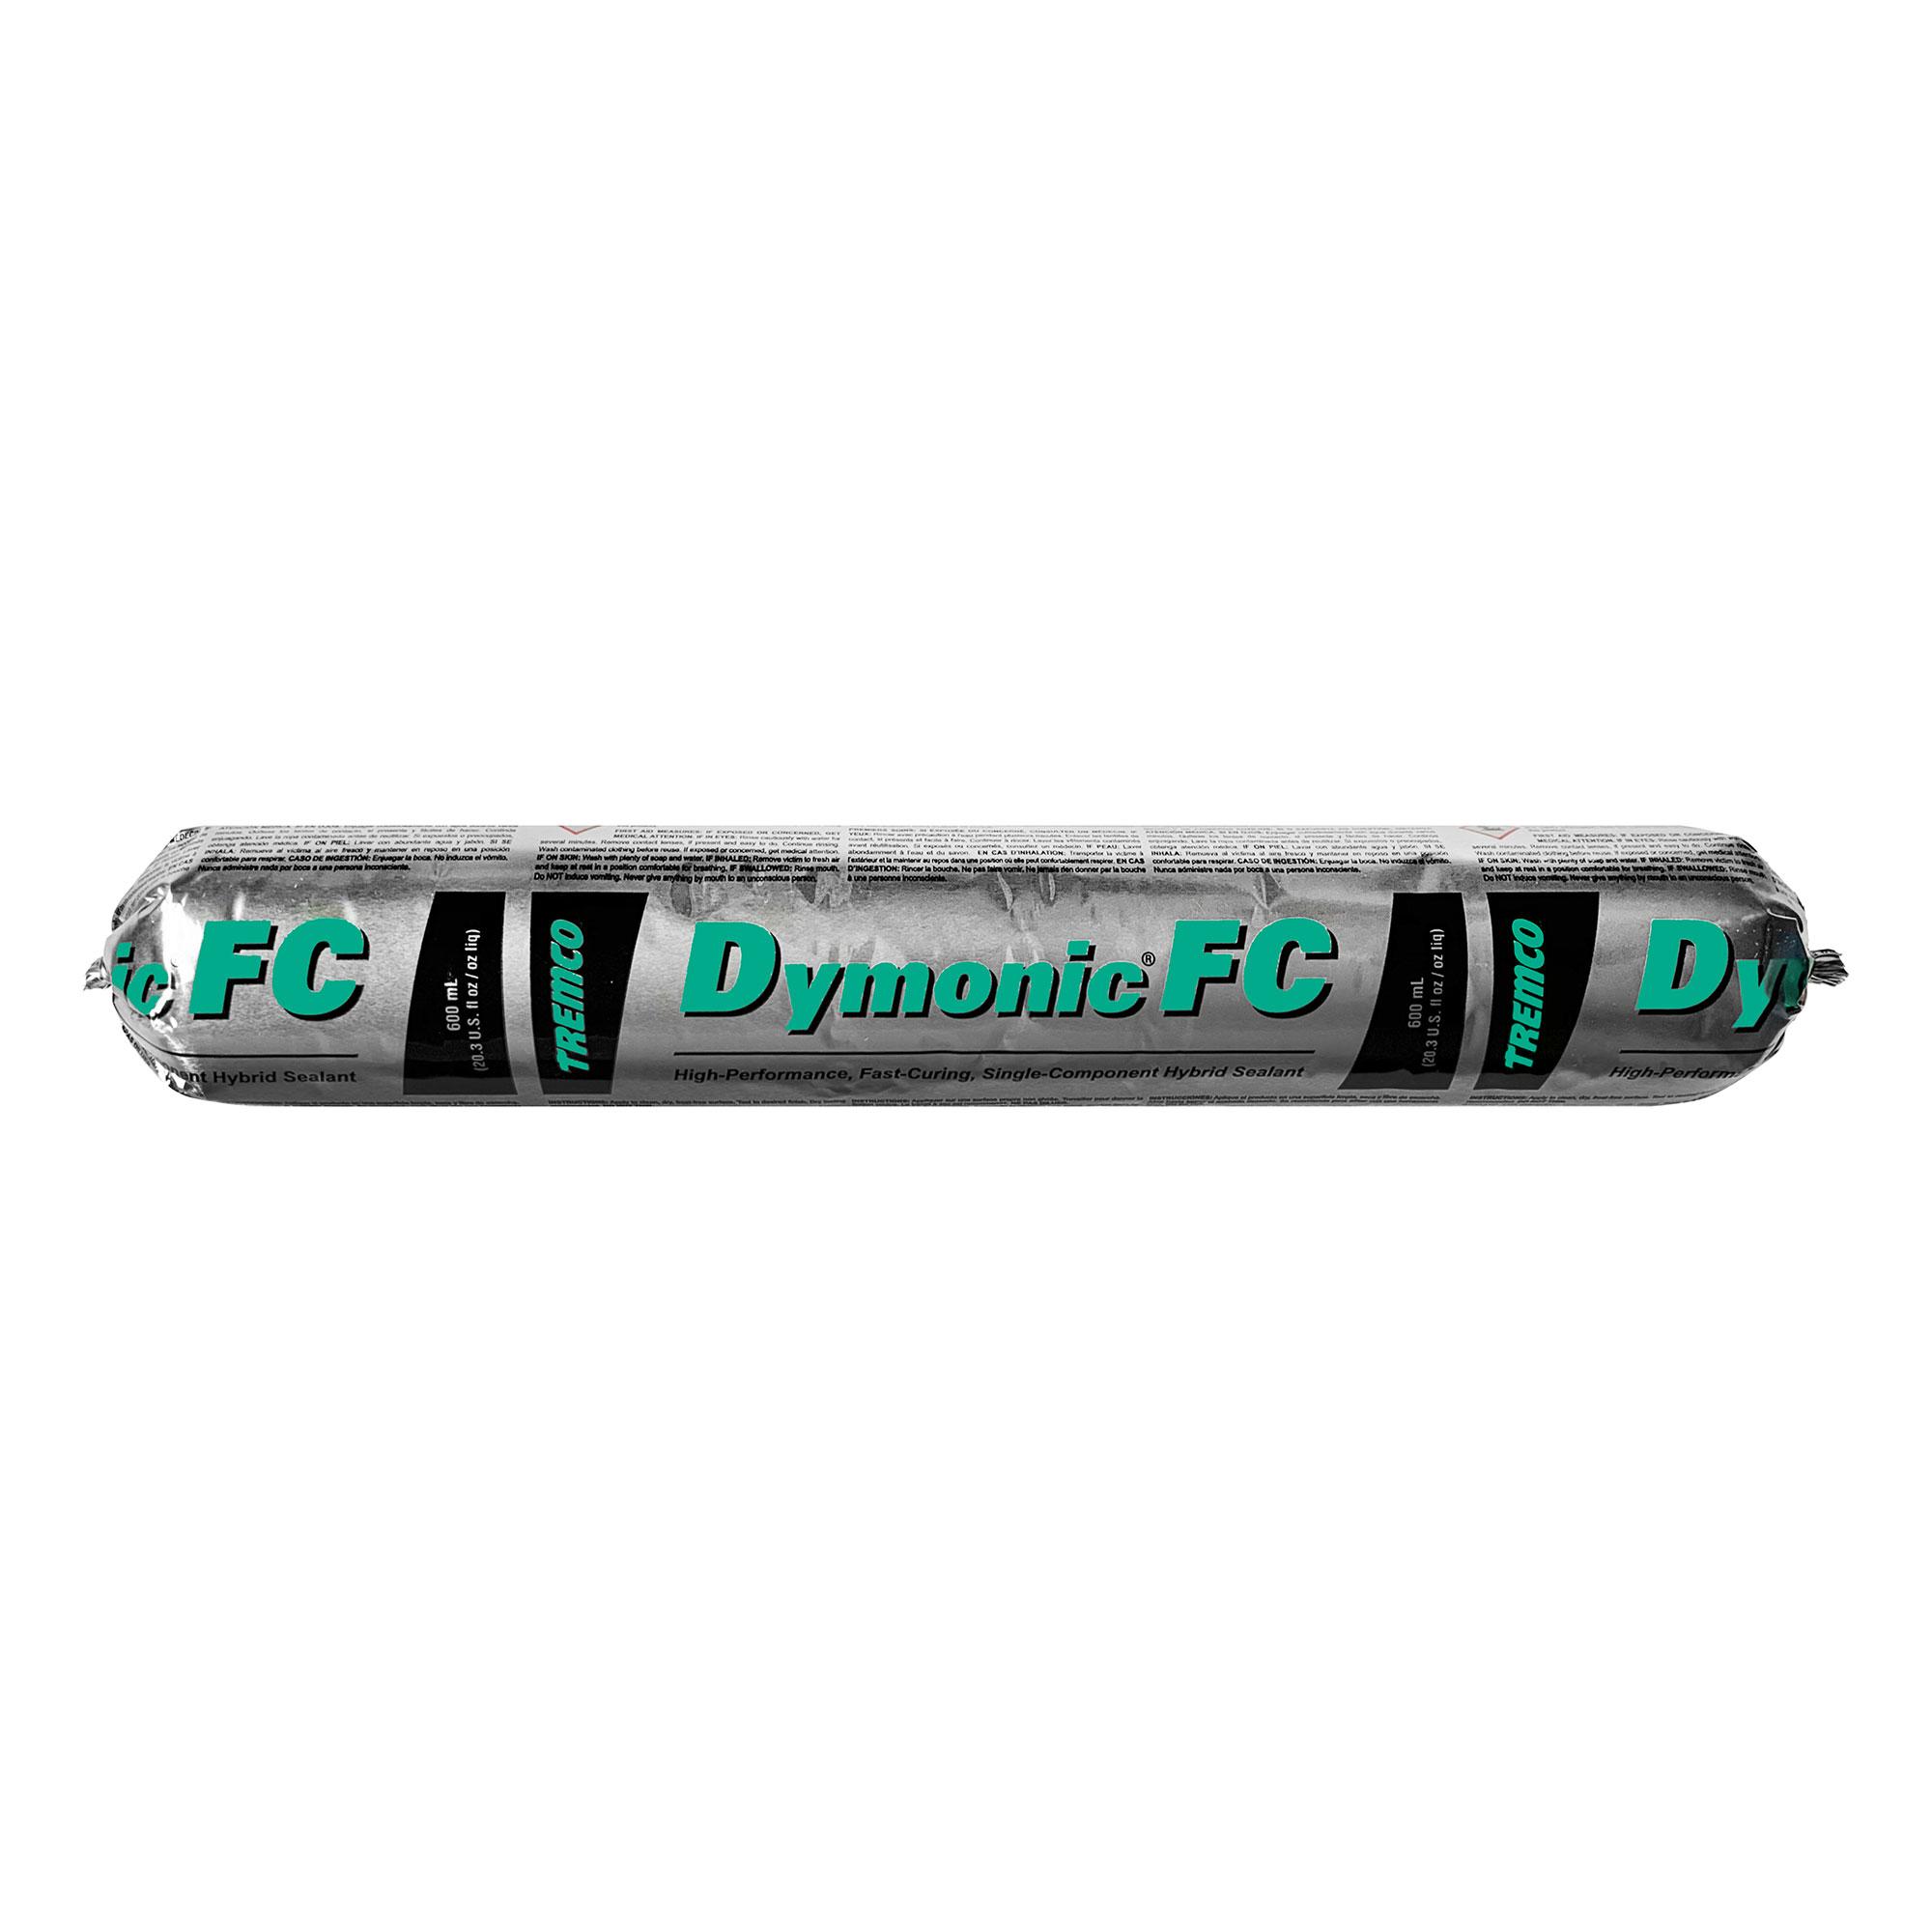 Tremco Dymonic Fc Polyurethane Sealant 20 3 Fluid Ounce Sausage Pksupplies Com